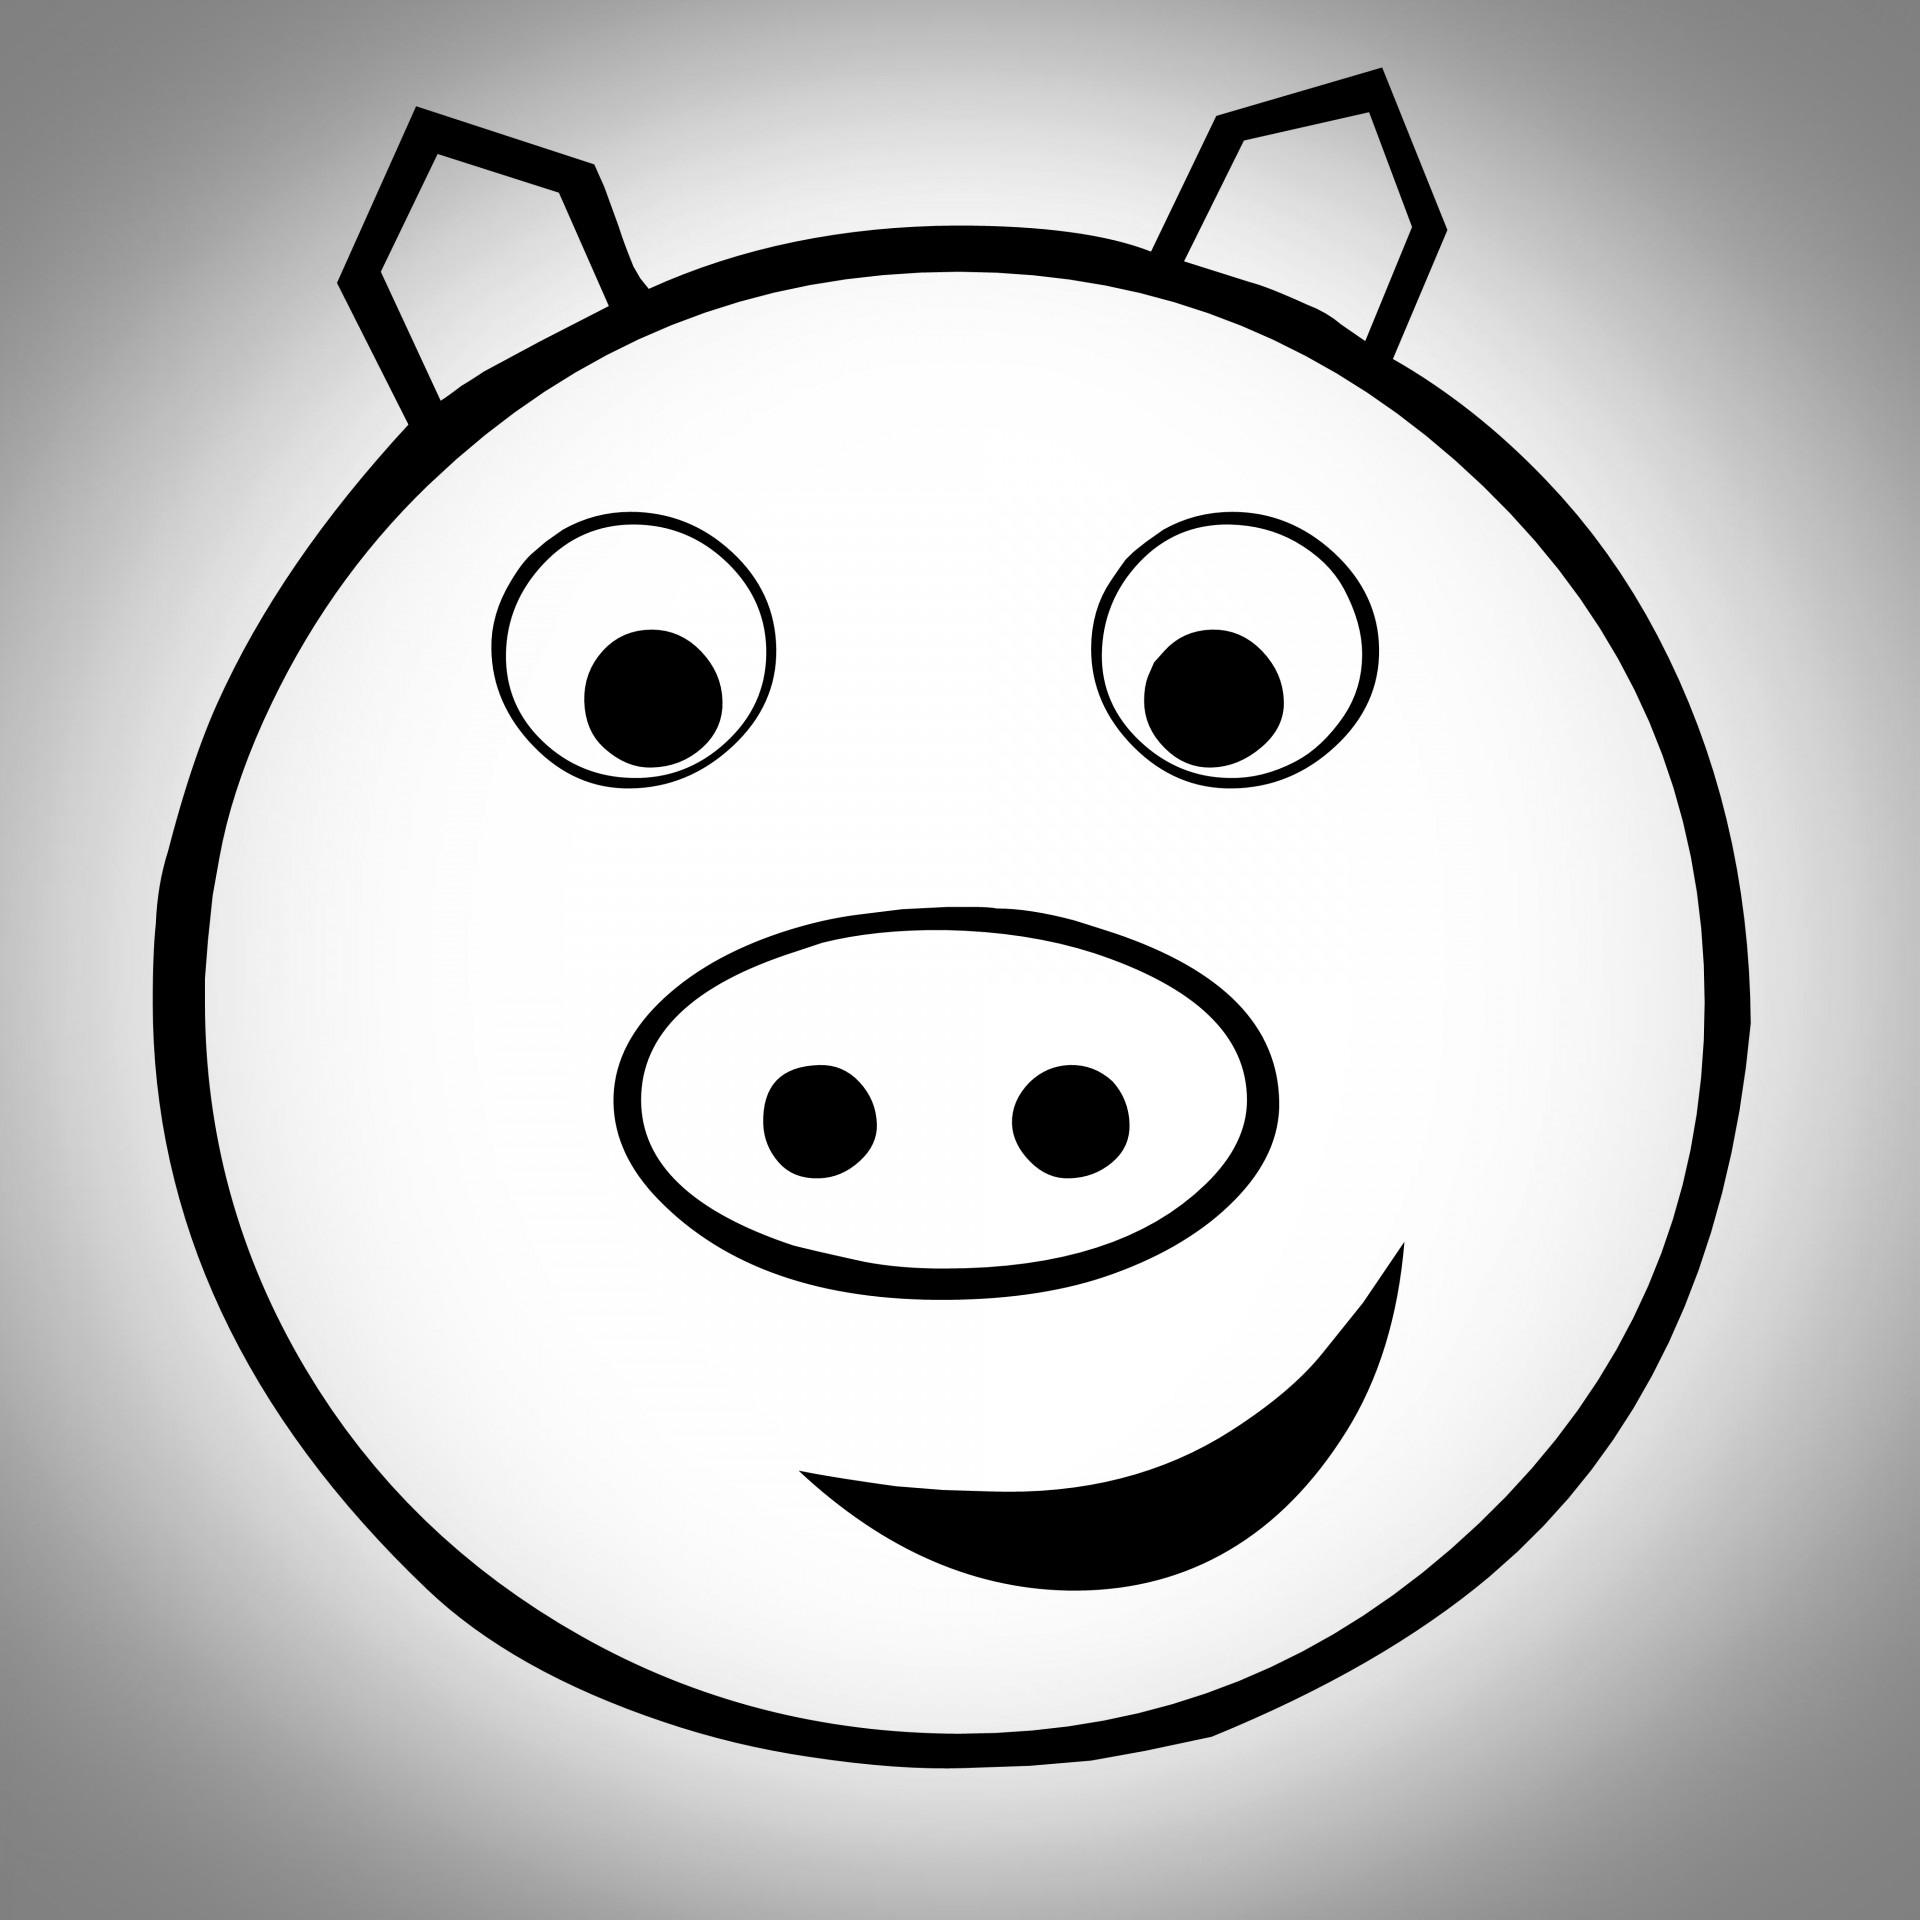 1920x1920 Drawing, Grey, Pig, Face, Vignette